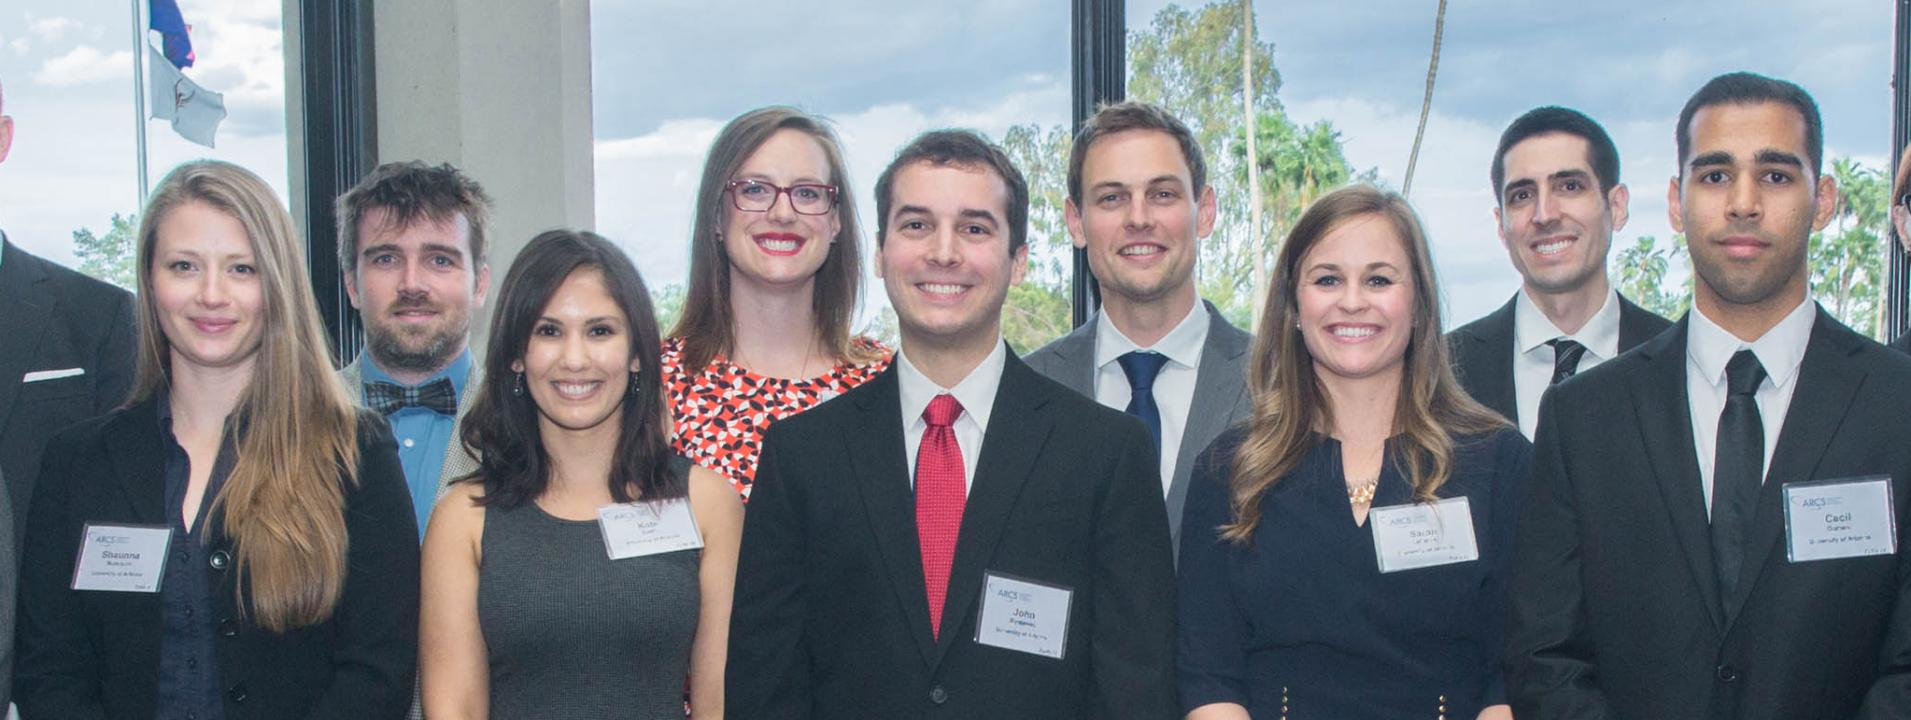 2016-2017 ARCS Foundation Phoenix Scholars